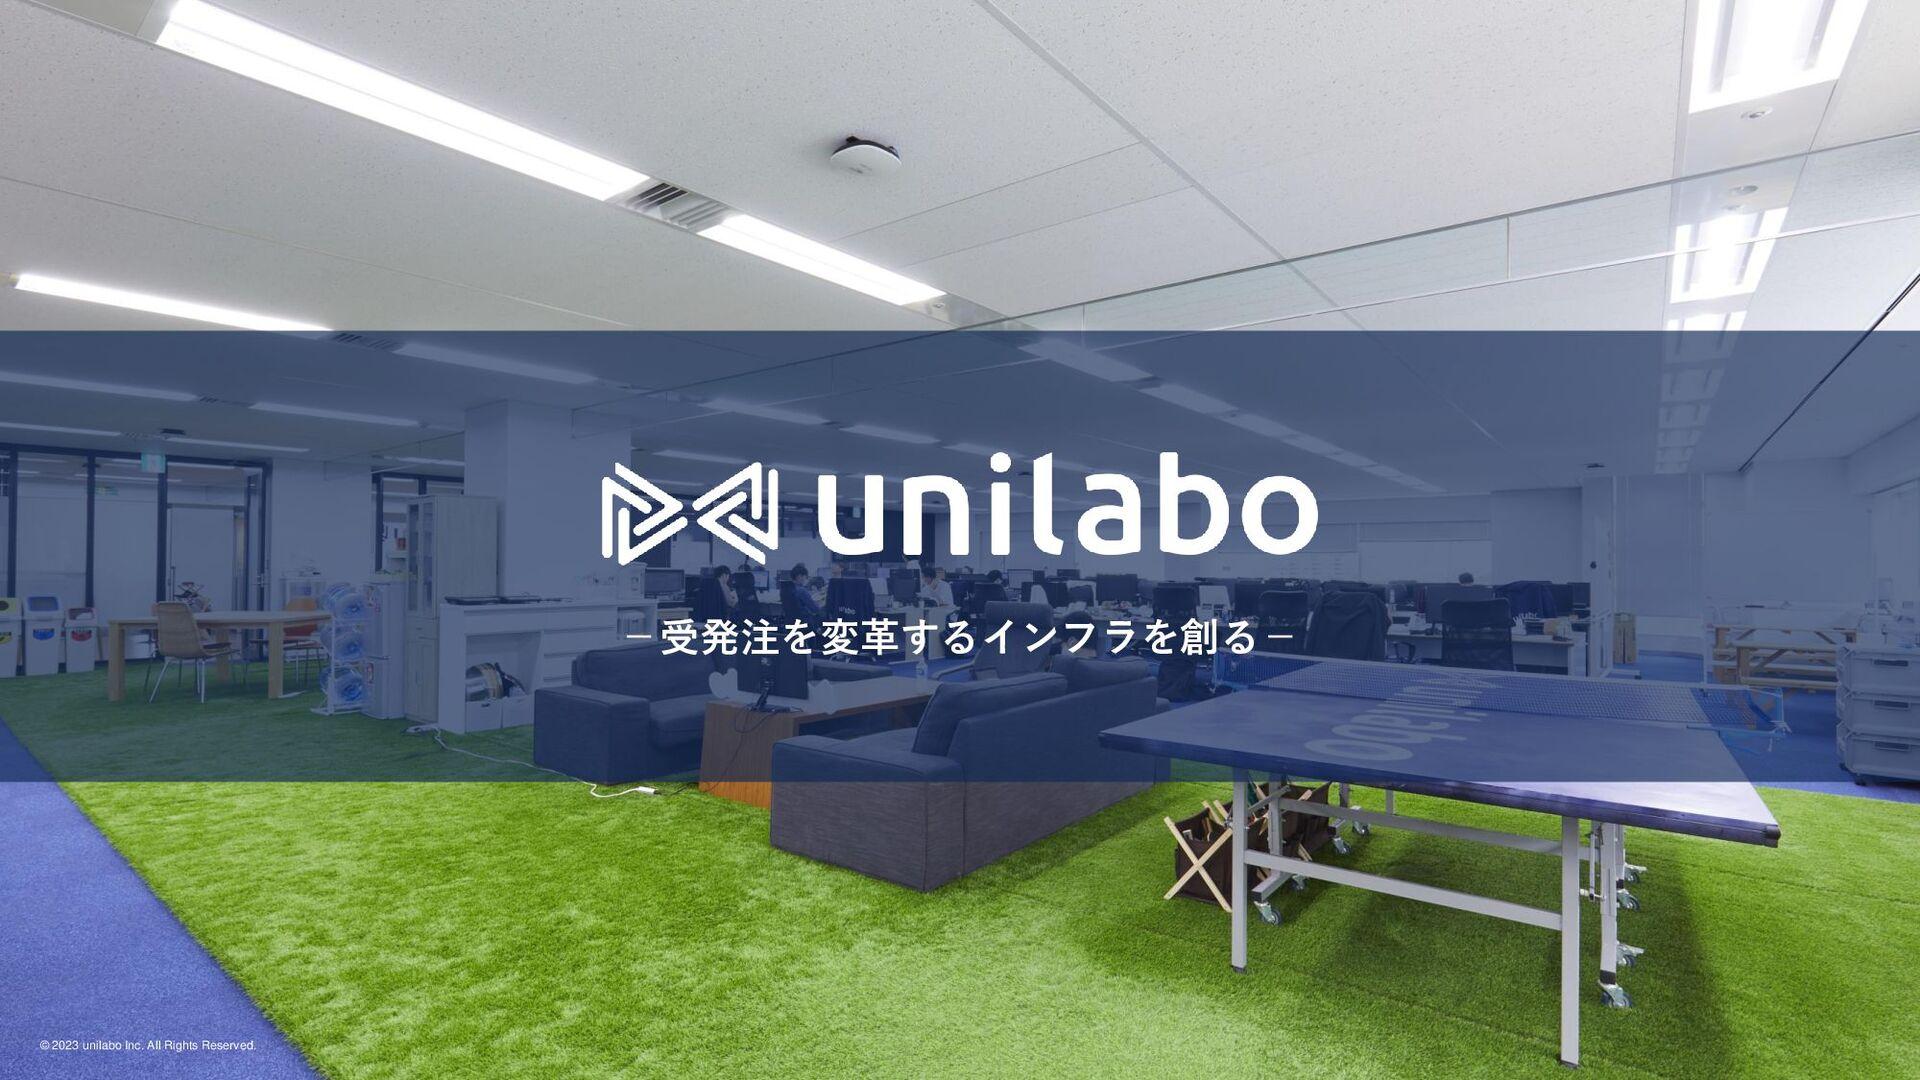 unilabo 会社紹介資料 2020年11月